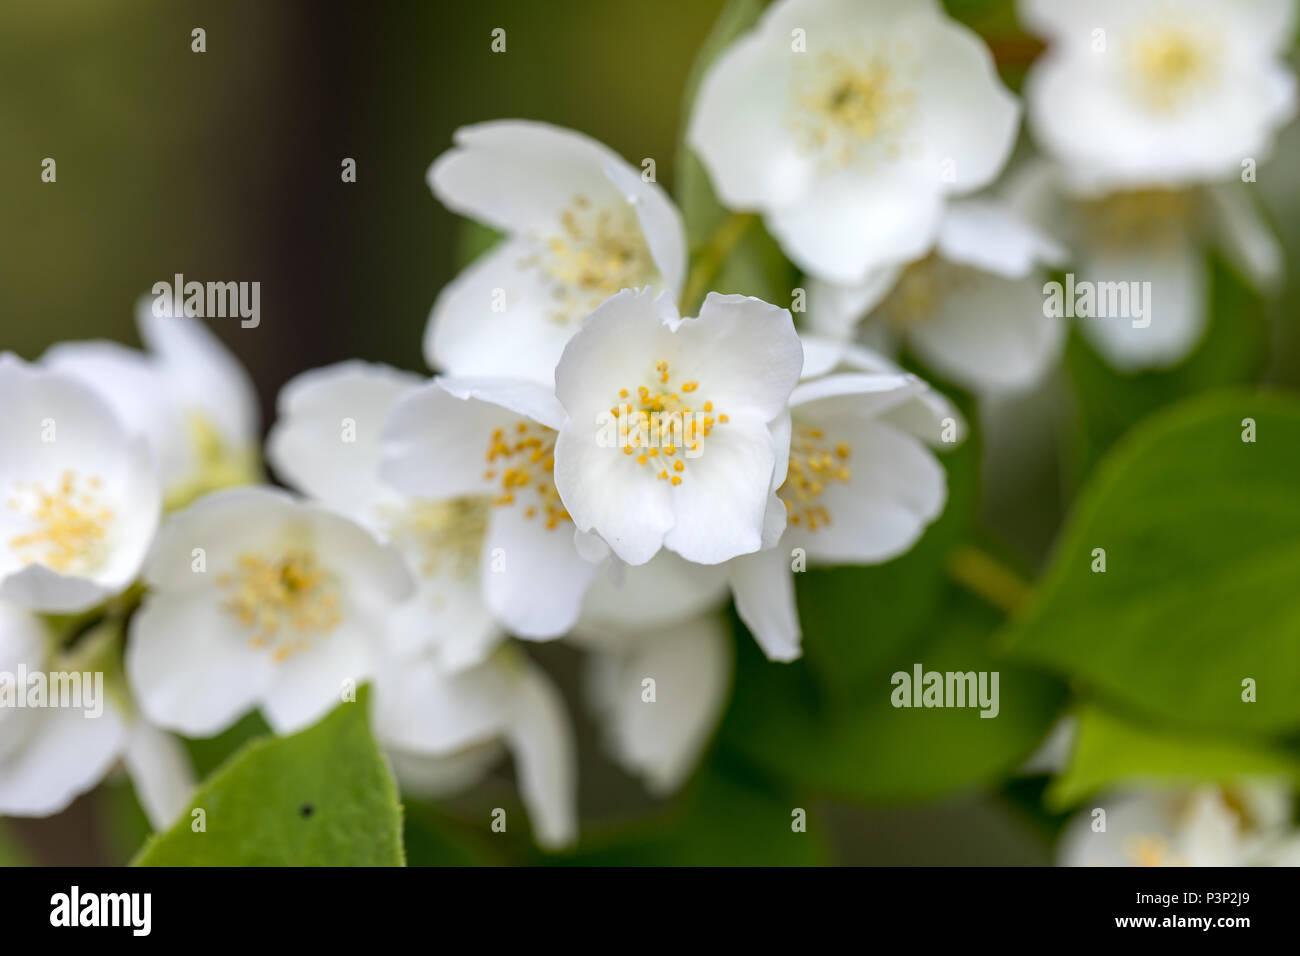 Beautiful blossoming branch of jasmine in garden - Stock Image